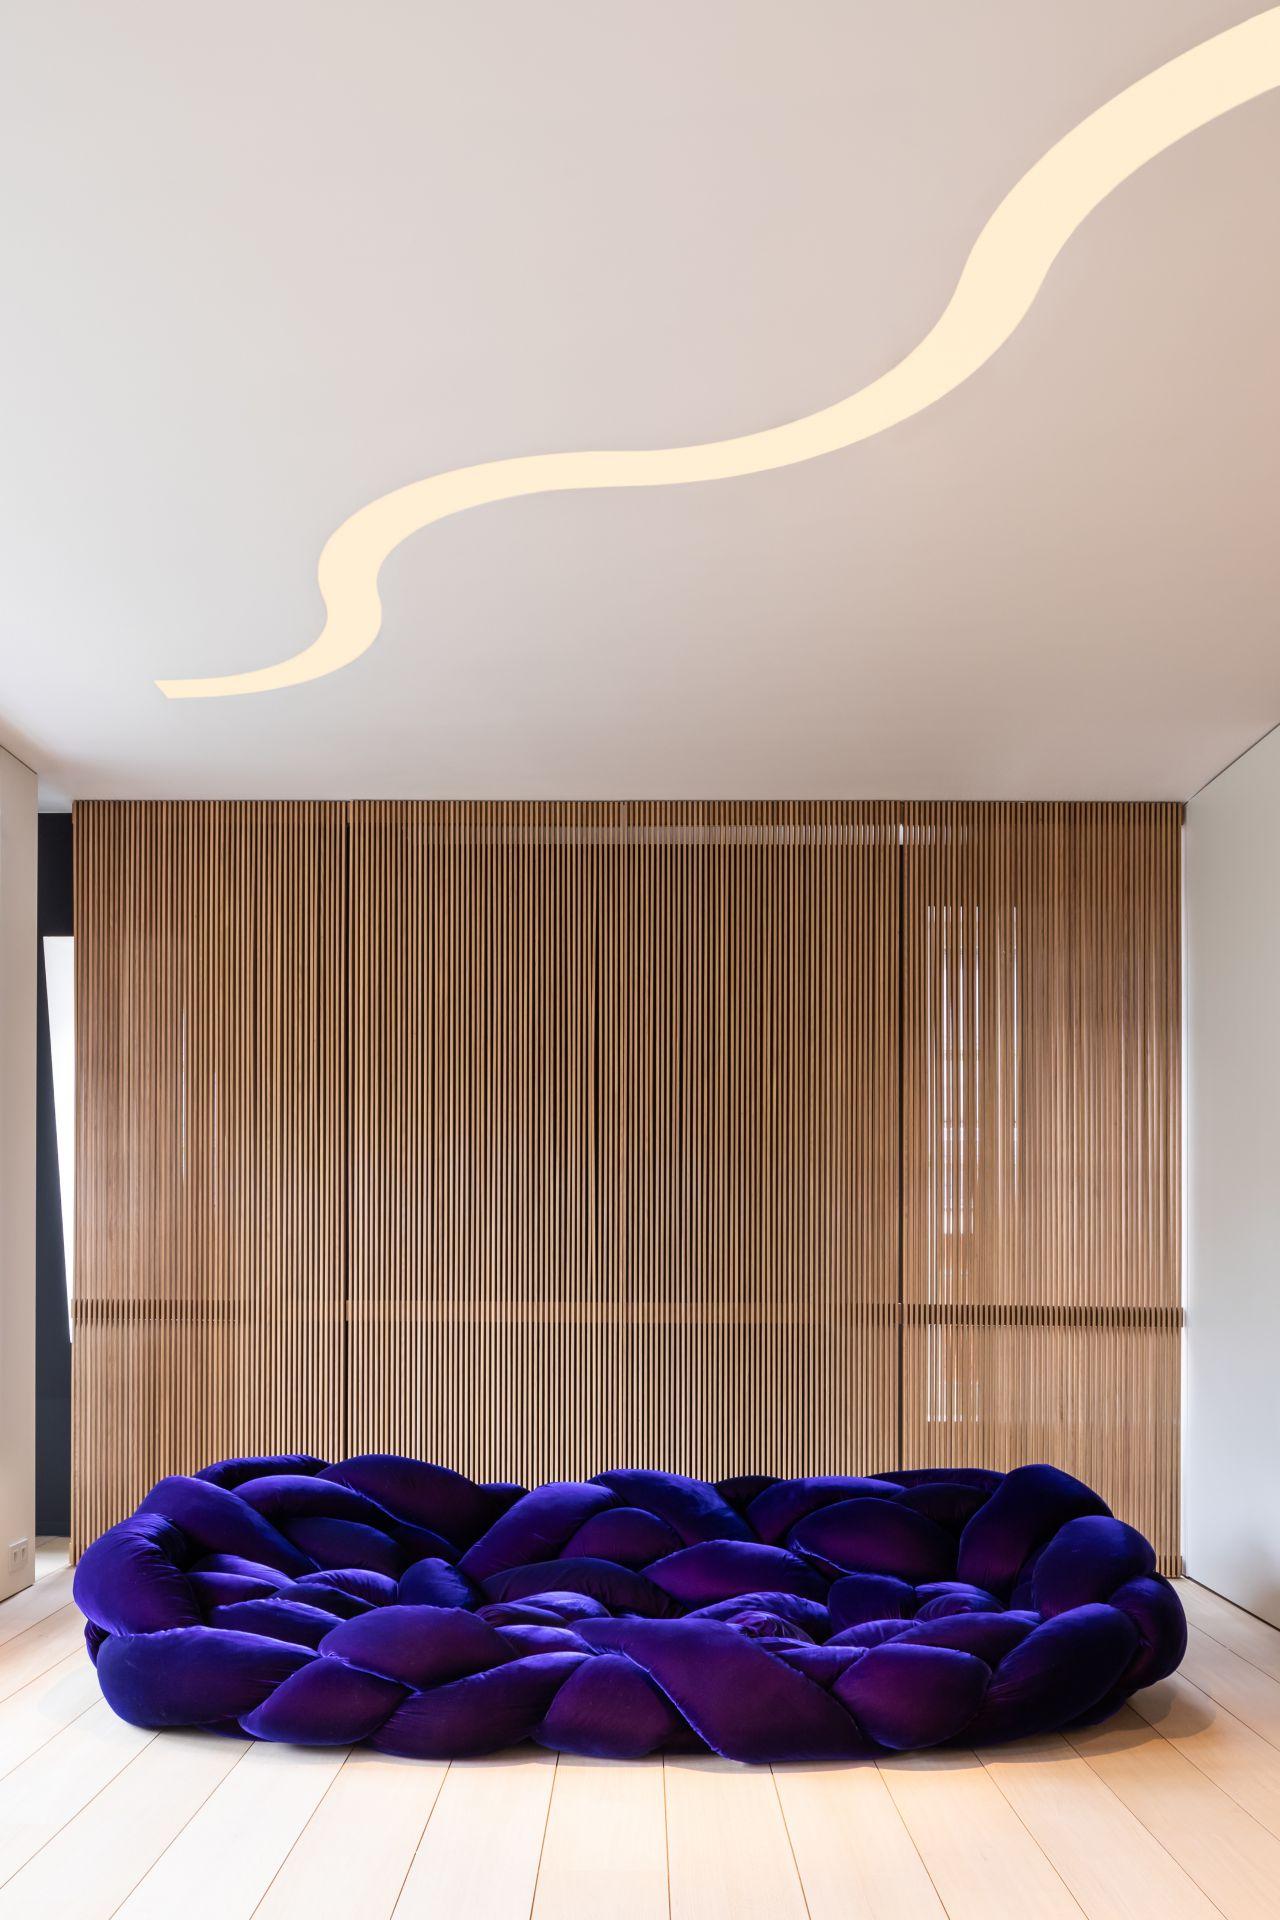 Appartamento ad Anversa - image 2